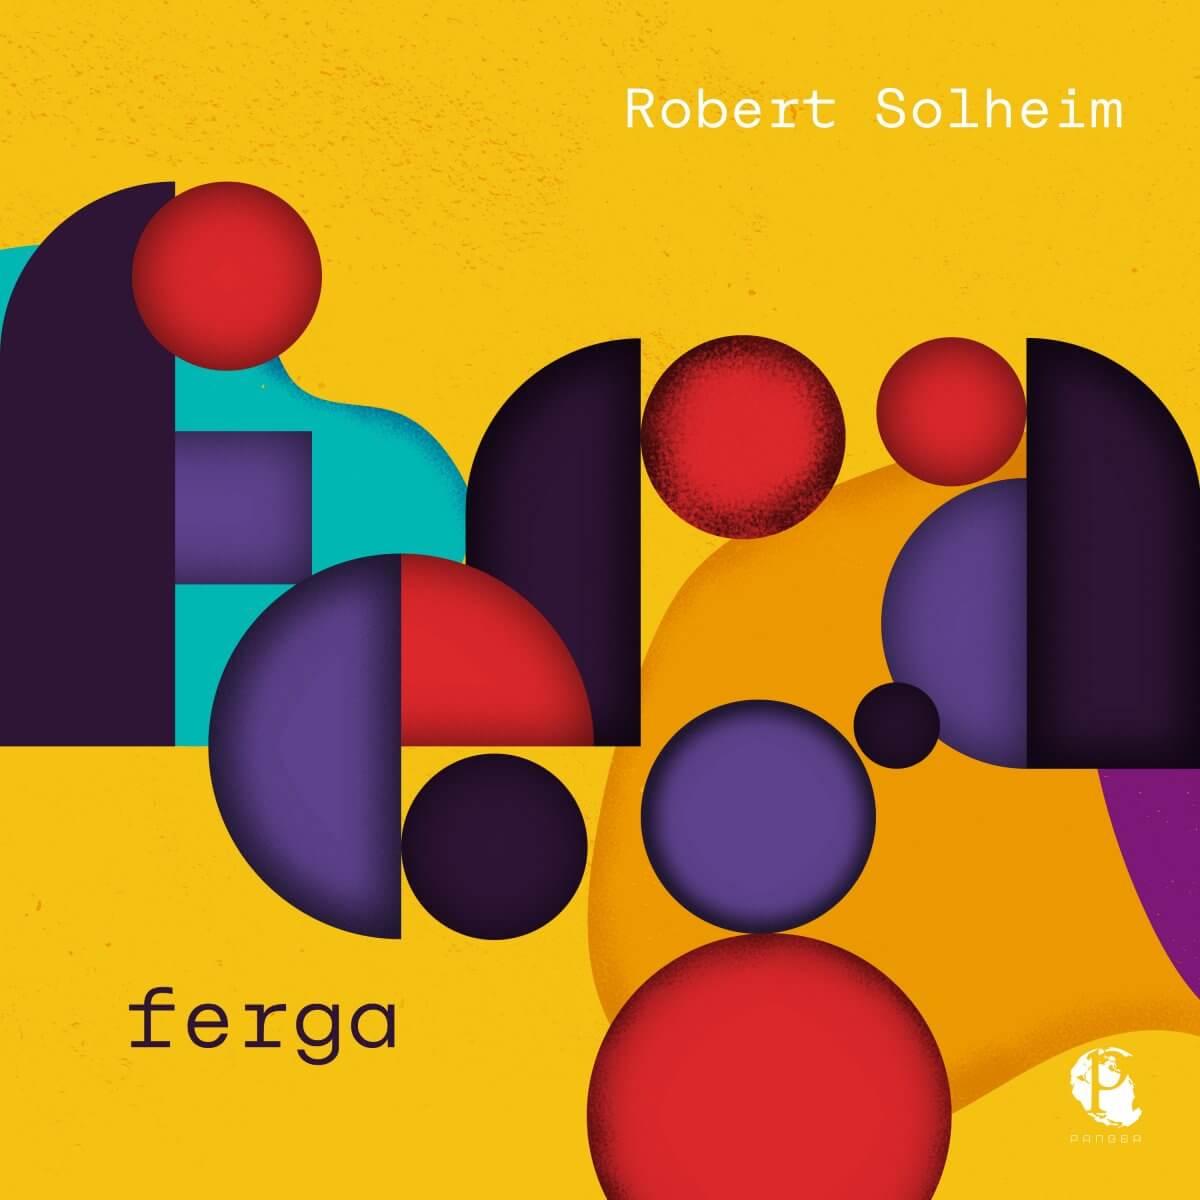 Robert-Solheim---Ferga